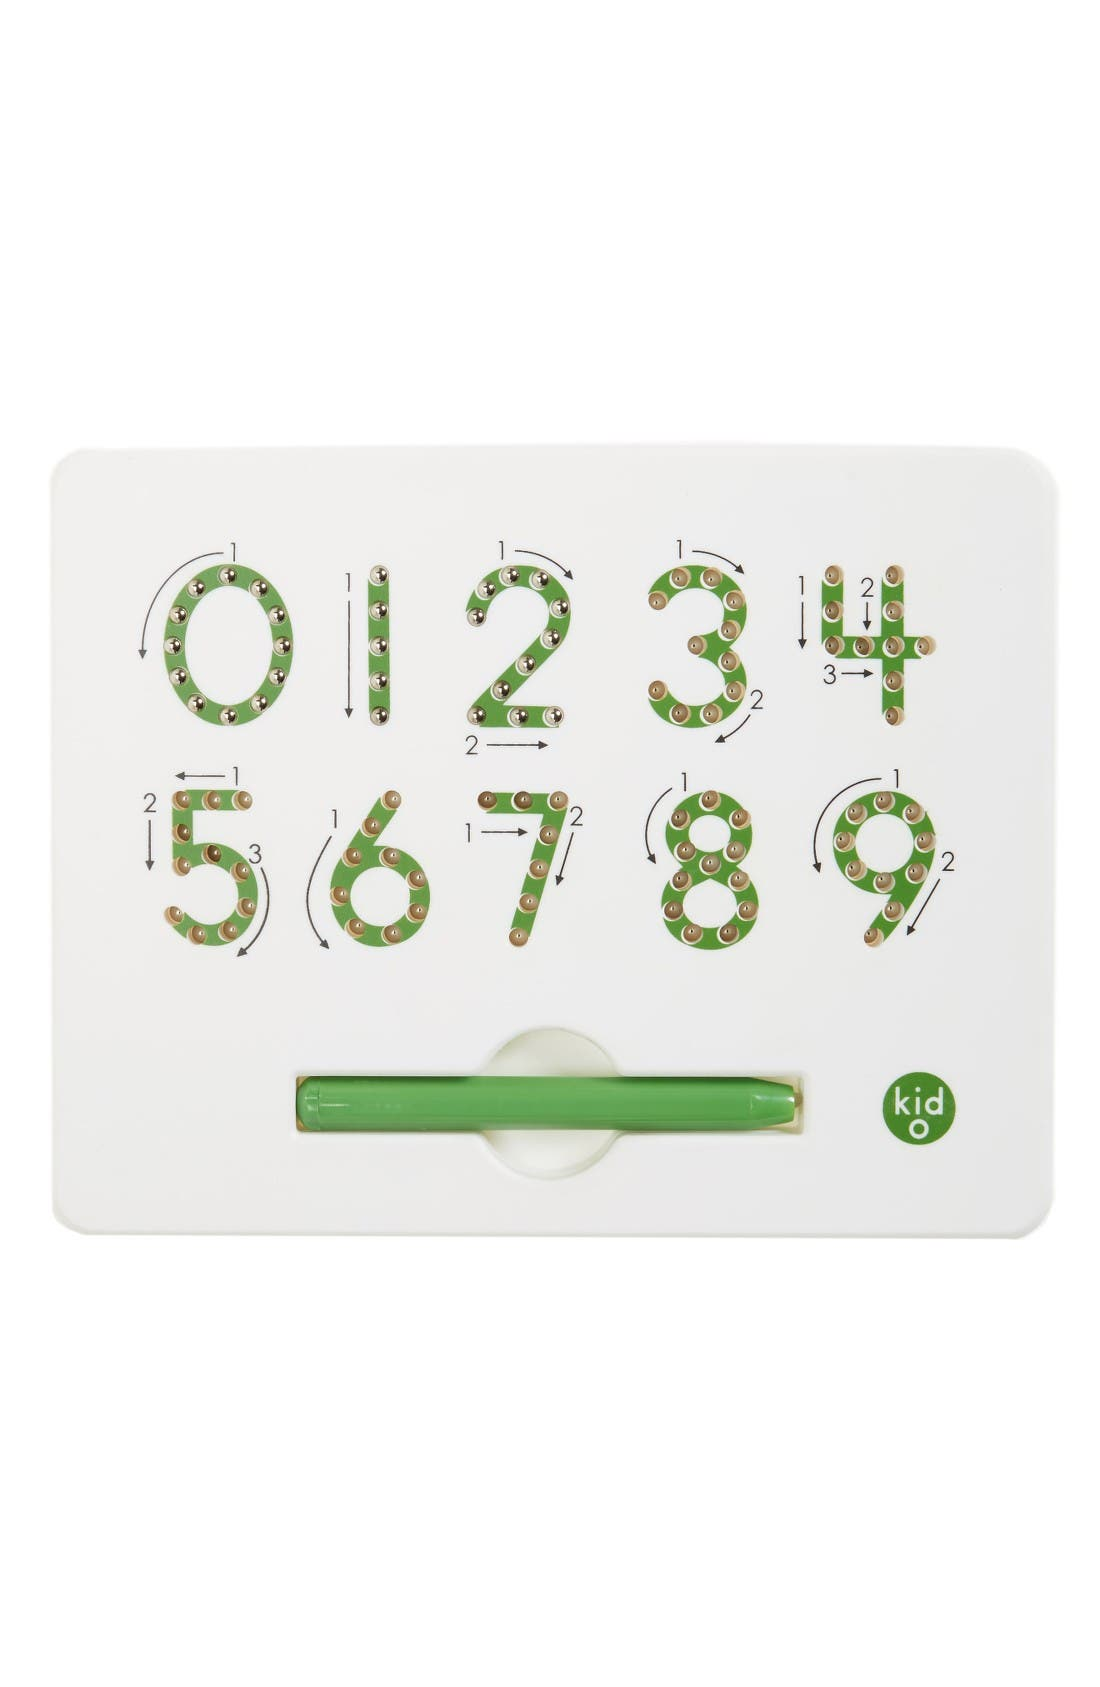 Kid O Magnetic Numbers Board